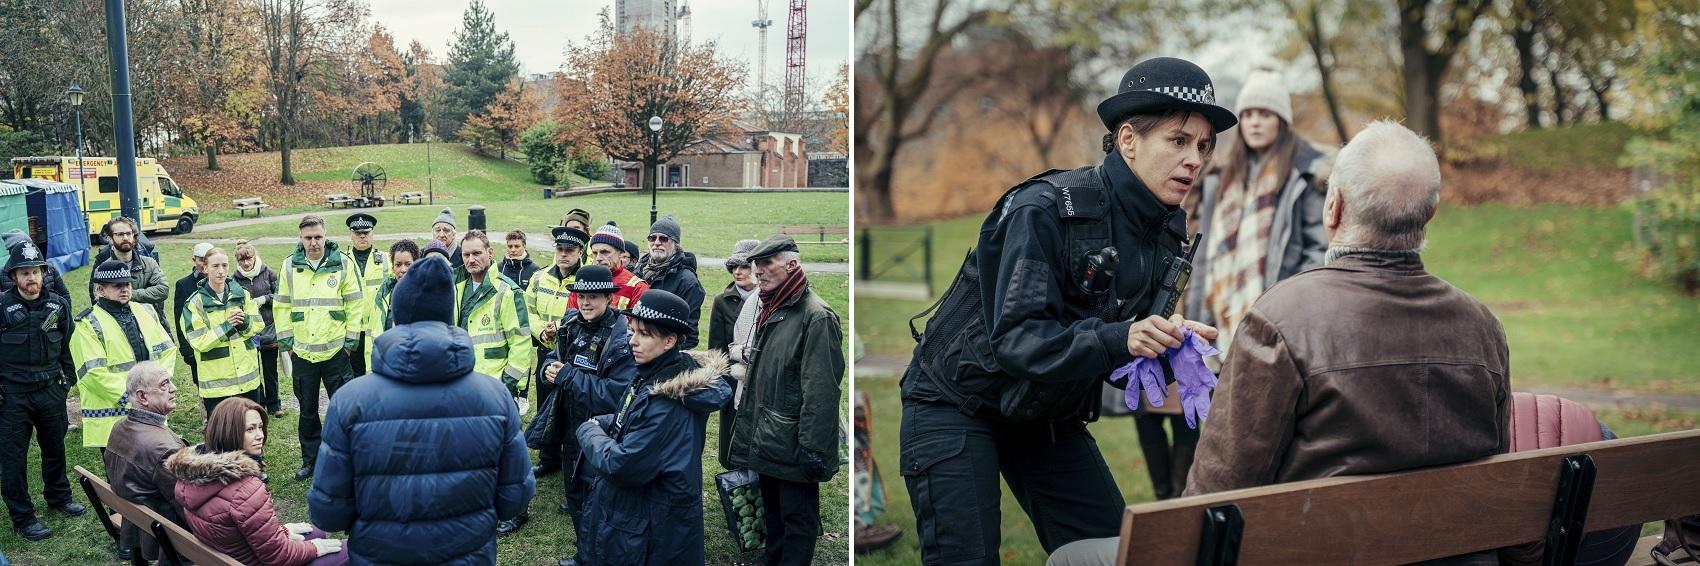 L-R Director Saul Dibb with cast in Bristol's Castle Park; Sgnt Tracy Holloway (Natalie Klamar) & Sergei Skripal (Wayne Swann). Credit BBC / Dancing Ledge / James Pardon